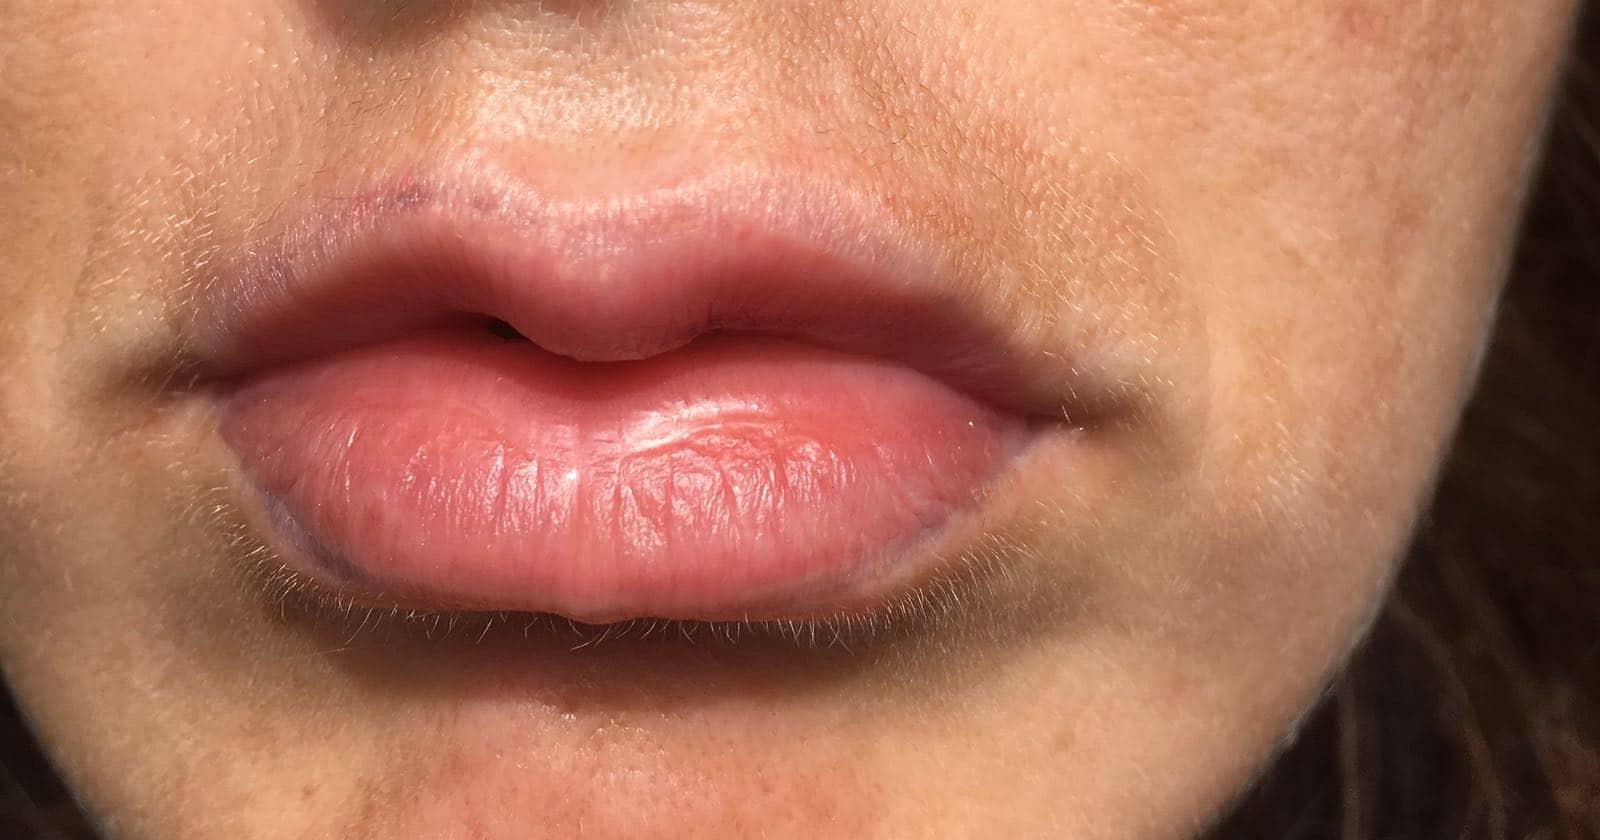 lippen permanent make up entfernen durch den profi rt tiefenbacher. Black Bedroom Furniture Sets. Home Design Ideas